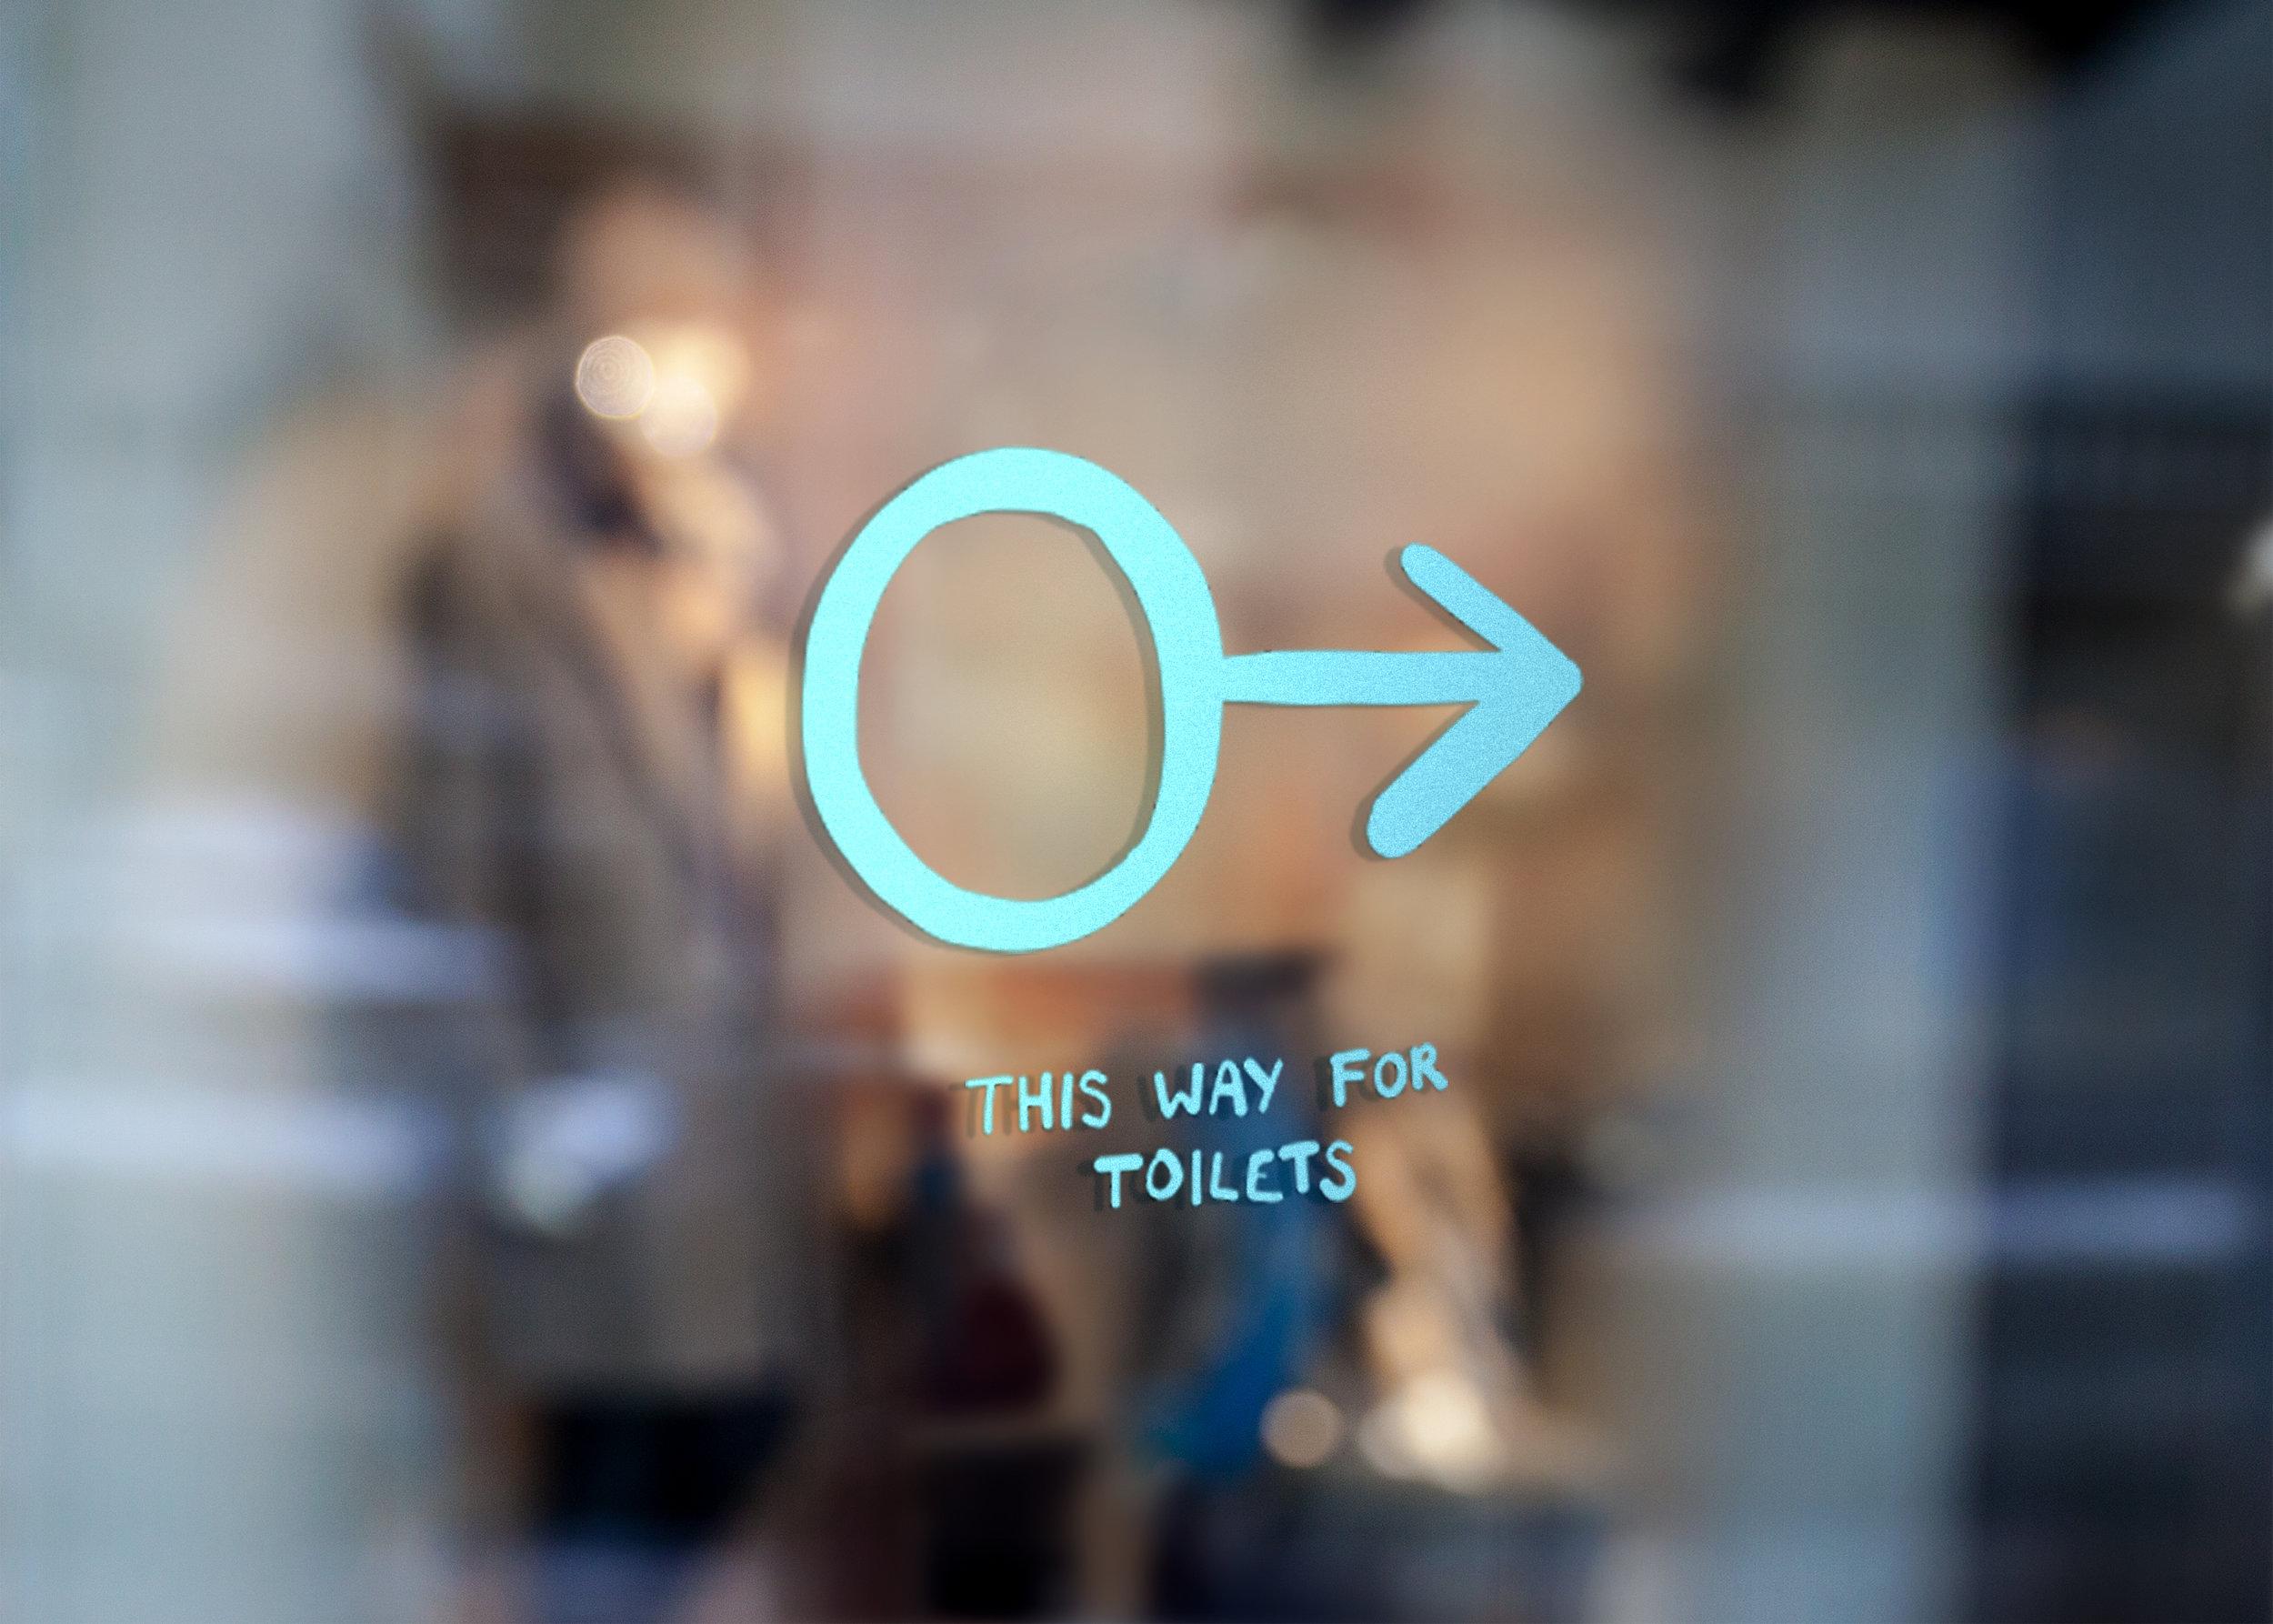 ToiletsStickerMockup.jpg